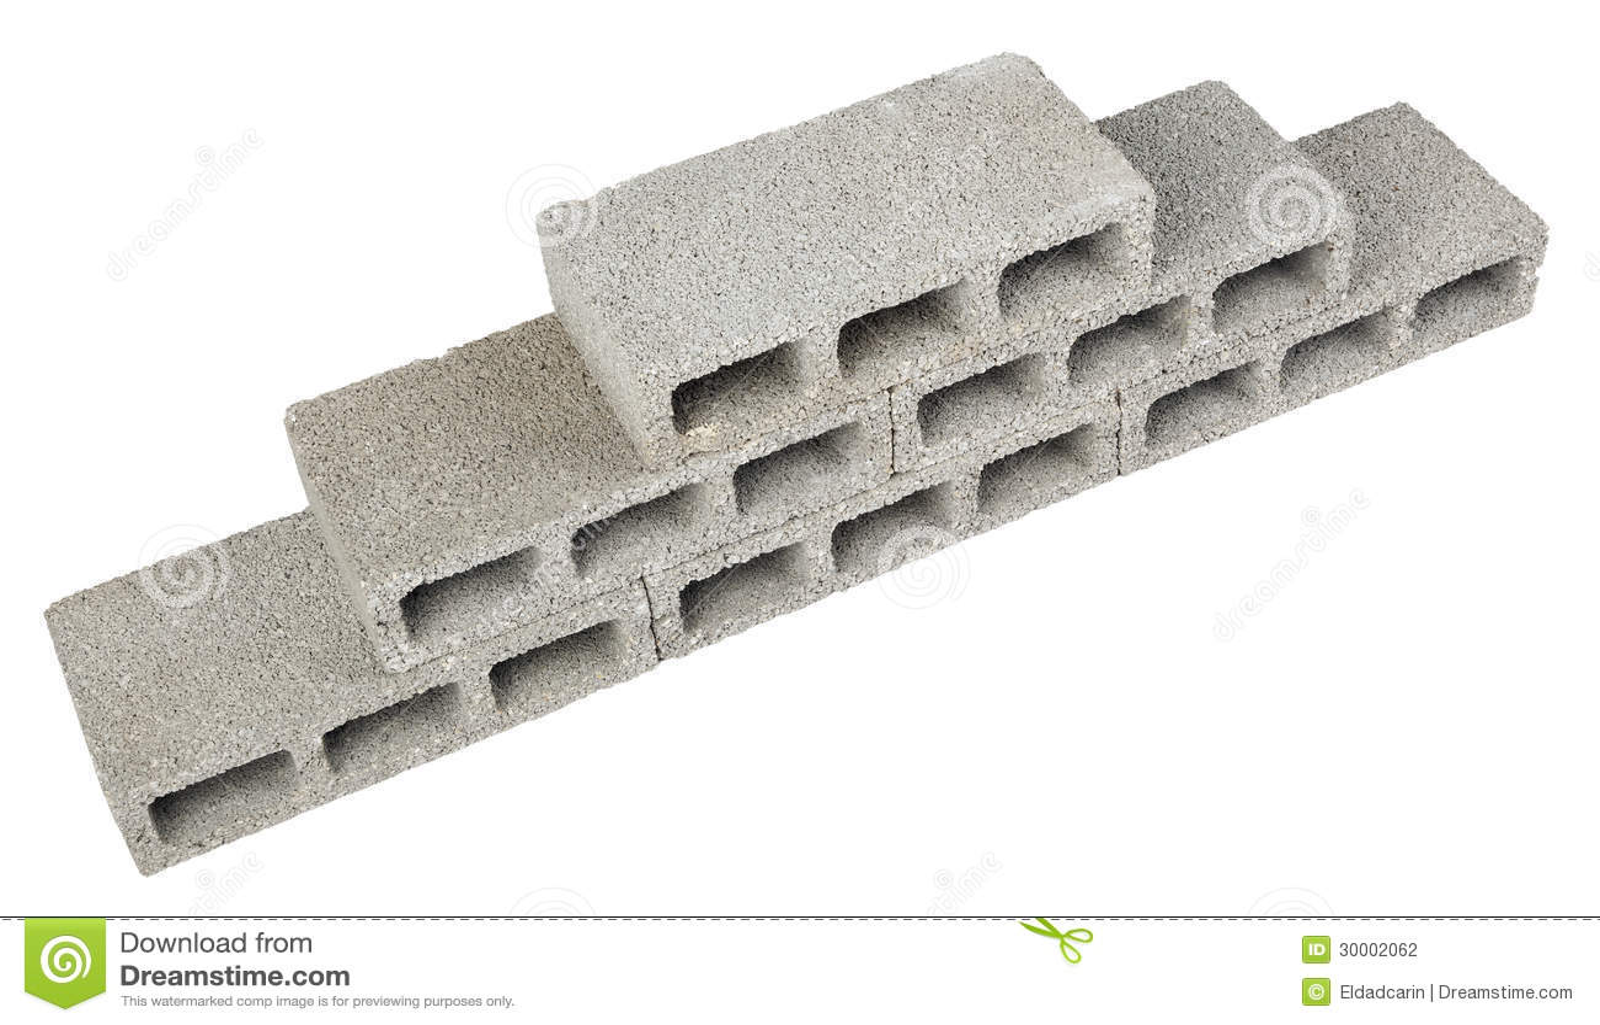 Construction blocks pyramid stock photography image for Cinder block vs concrete foundation